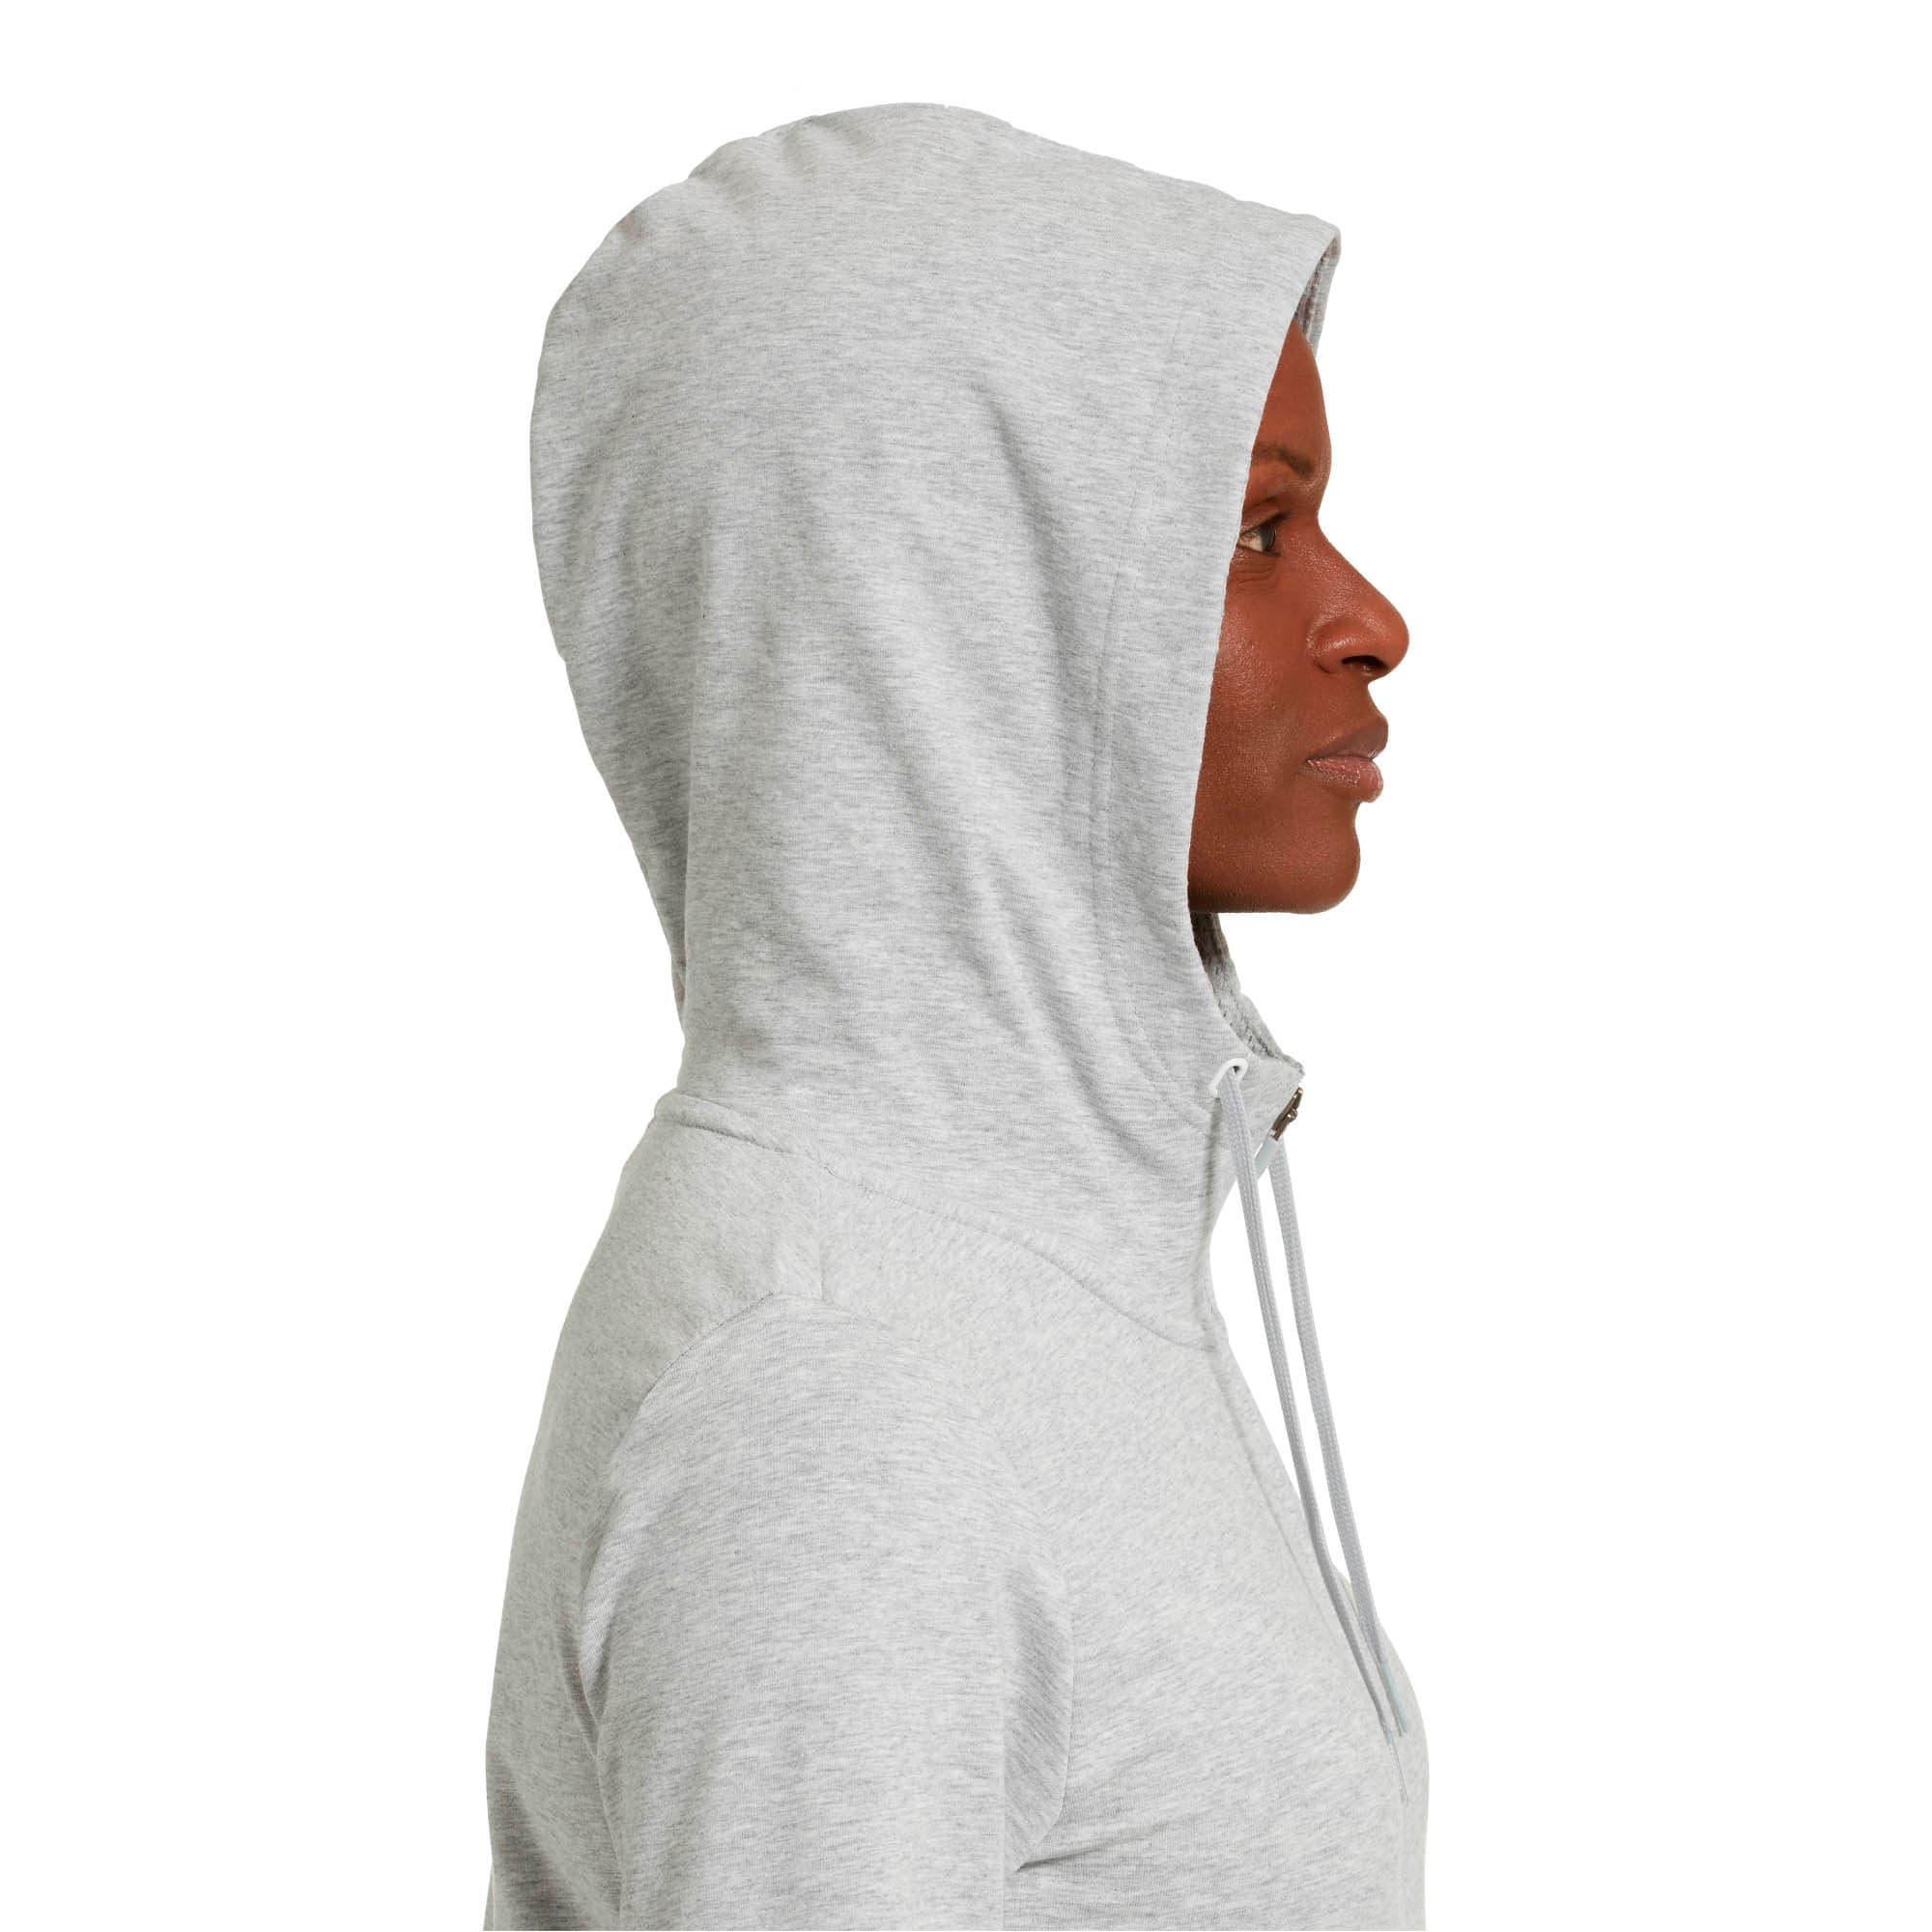 Thumbnail 4 of Modern Sports Hooded Jacket, Light Gray Heather, medium